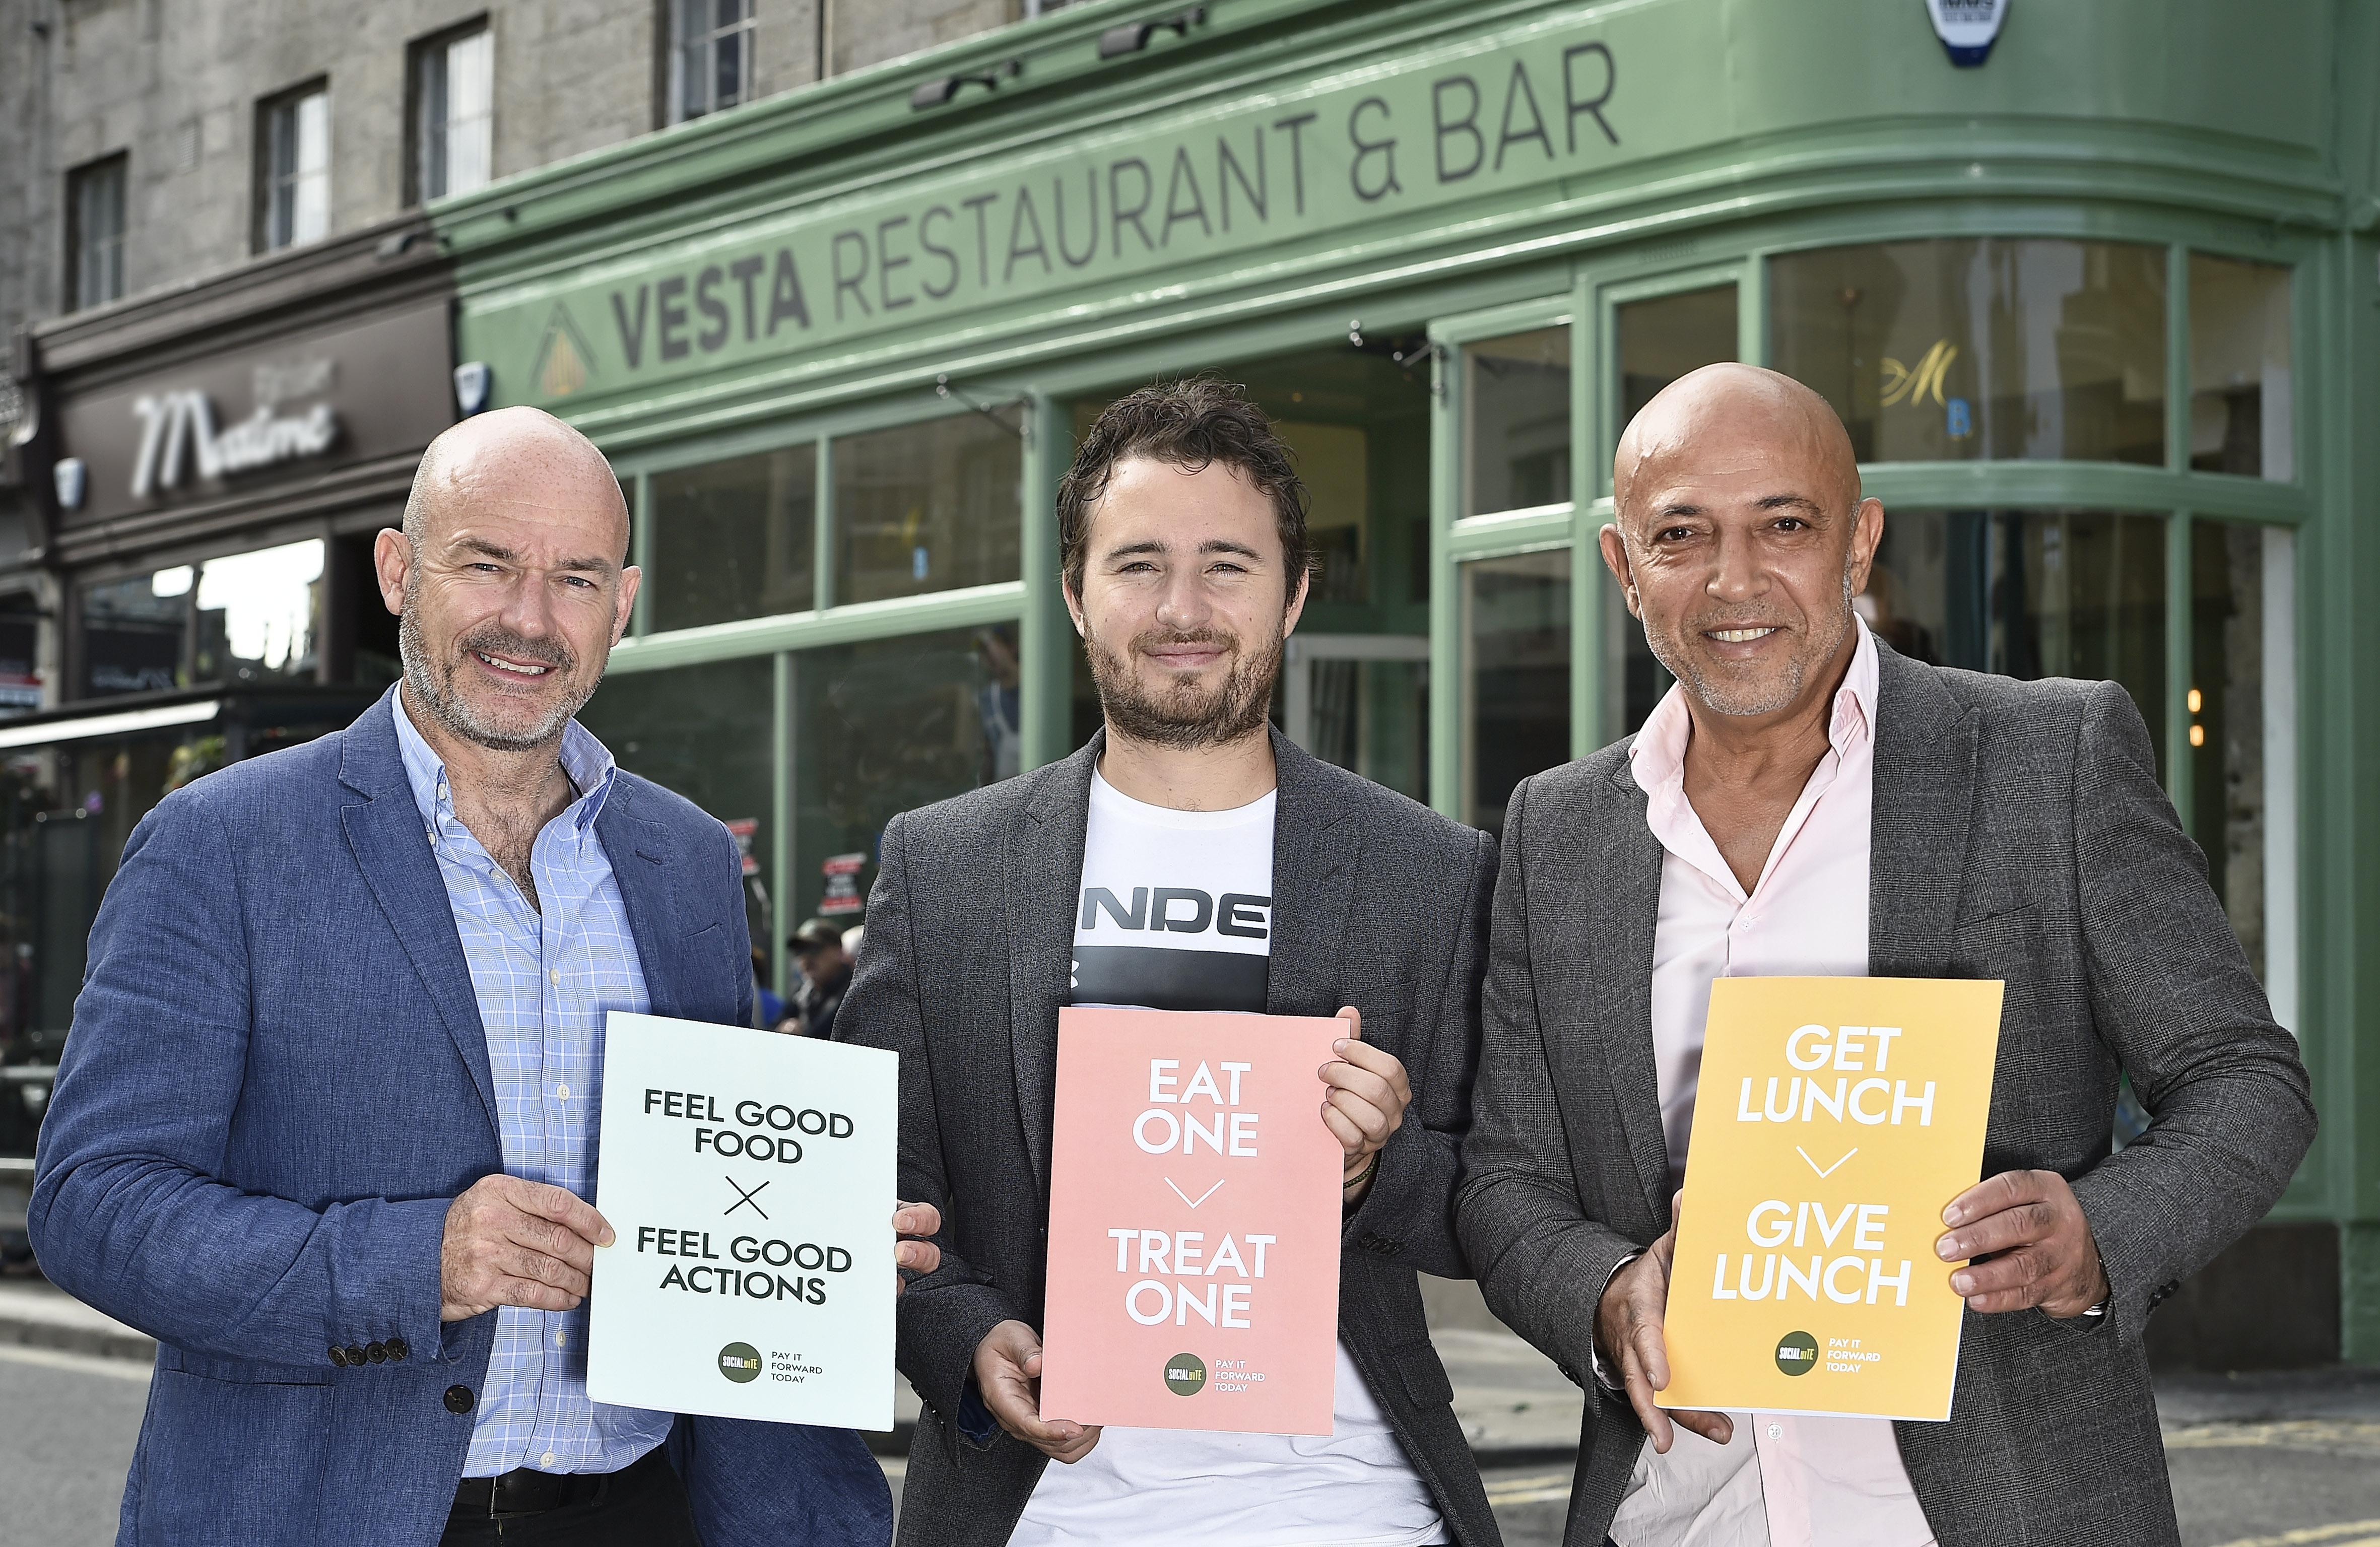 Vesta Restaurant & Bar: Same Location, Same Ethos, New Exciting Venture!